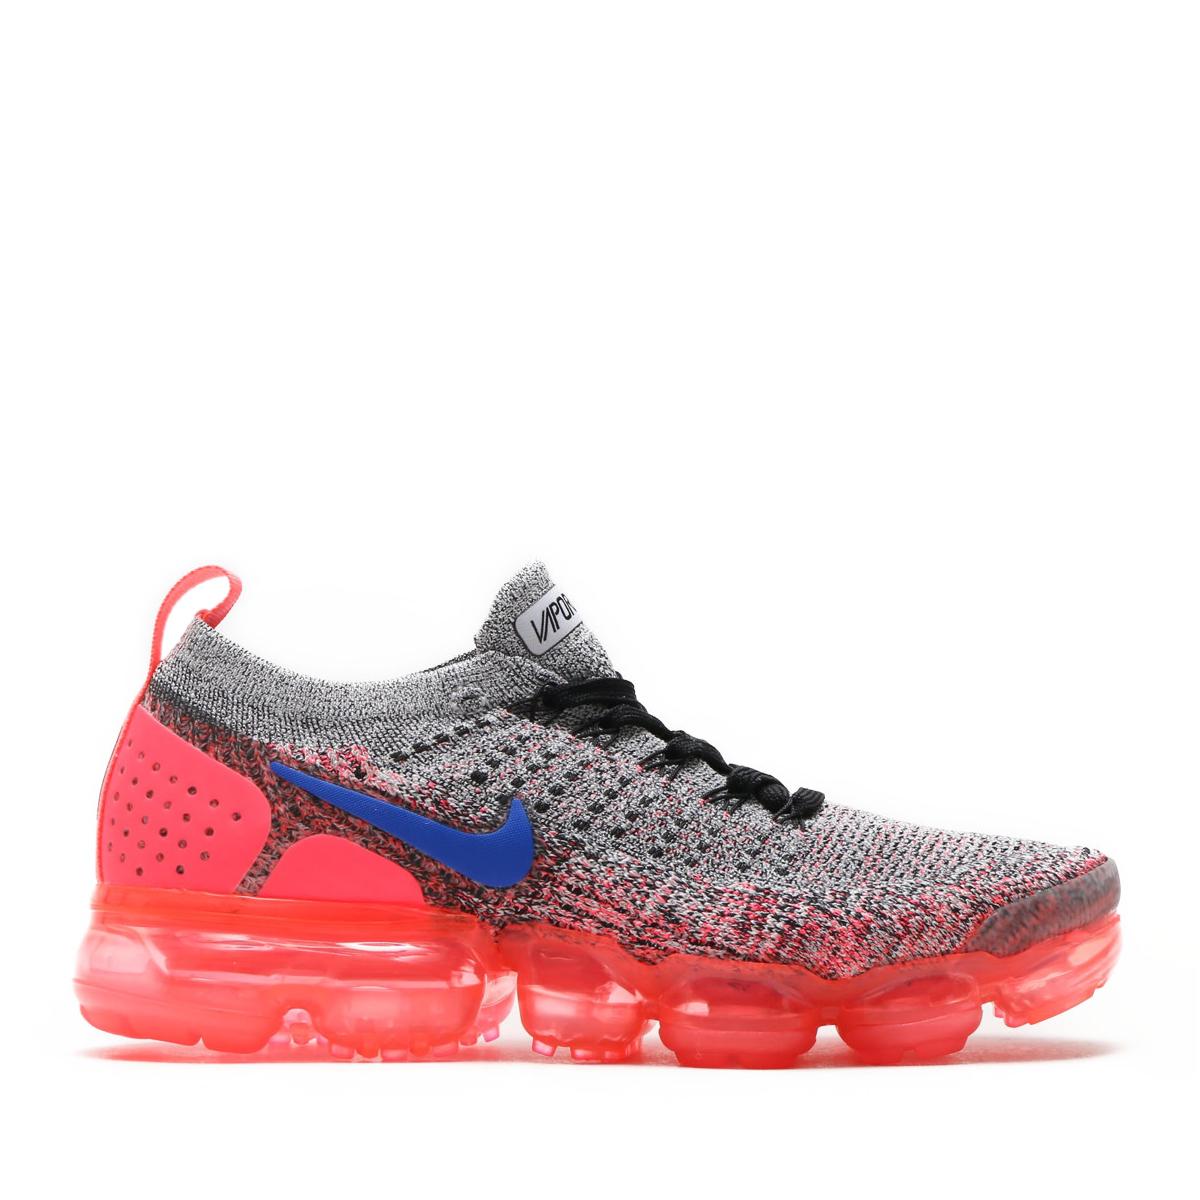 f98752c96f8 NIKE W AIR VAPORMAX FLYKNIT 2 (Nike women air vapor max fried food knit 2)  (WHITE ULTRAMARINE-HOT PUNCH-BLACK) 18SU-S